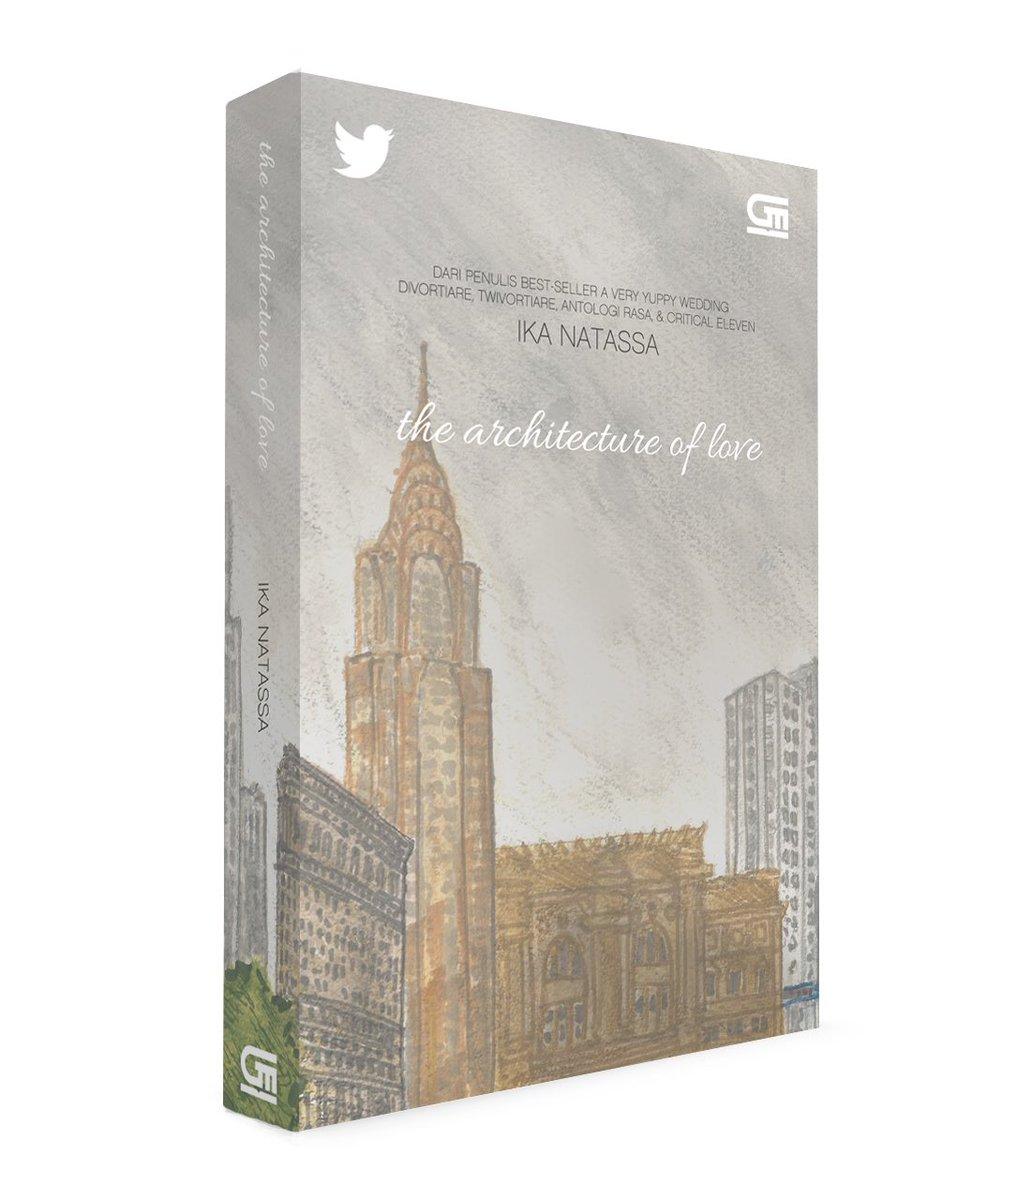 Mau ngukur kuota PO nih. RT twit ini kalau kelen mau PO The Architecture of Love bulan depan.